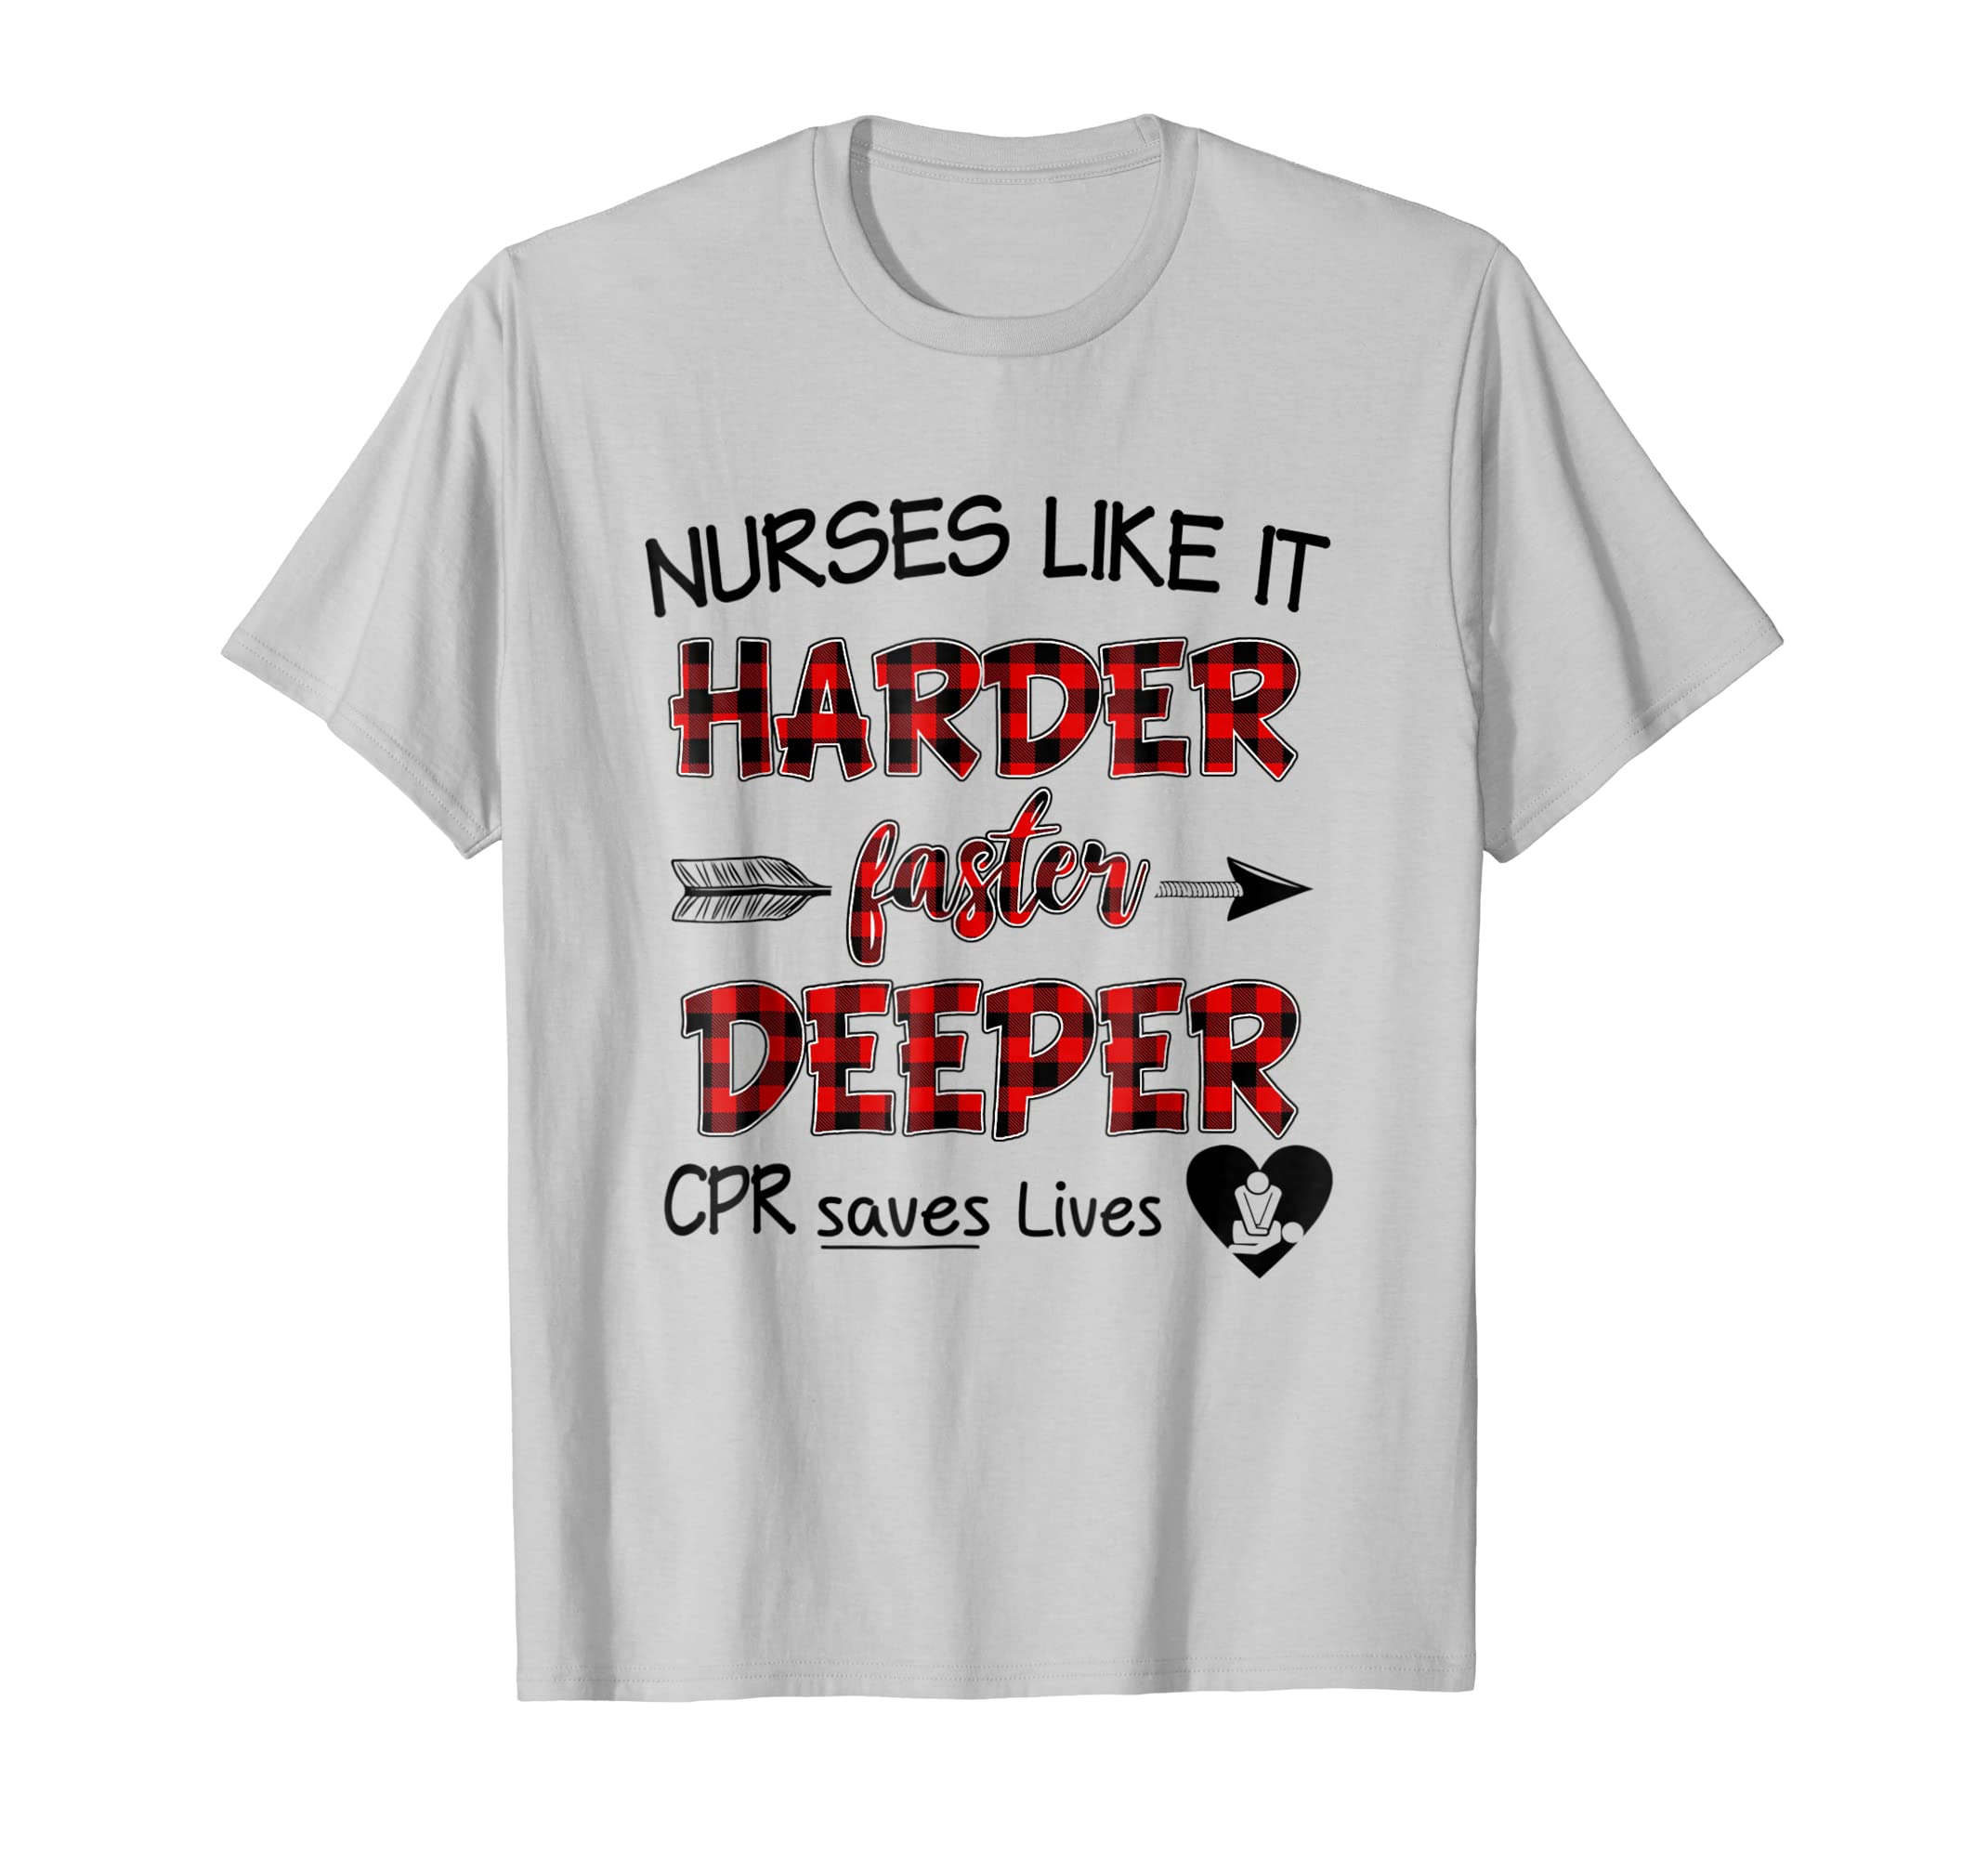 671935569 Nurses Like It Harder Faster Deeper Cpr Saves Lives Tshirt Hoodie ...